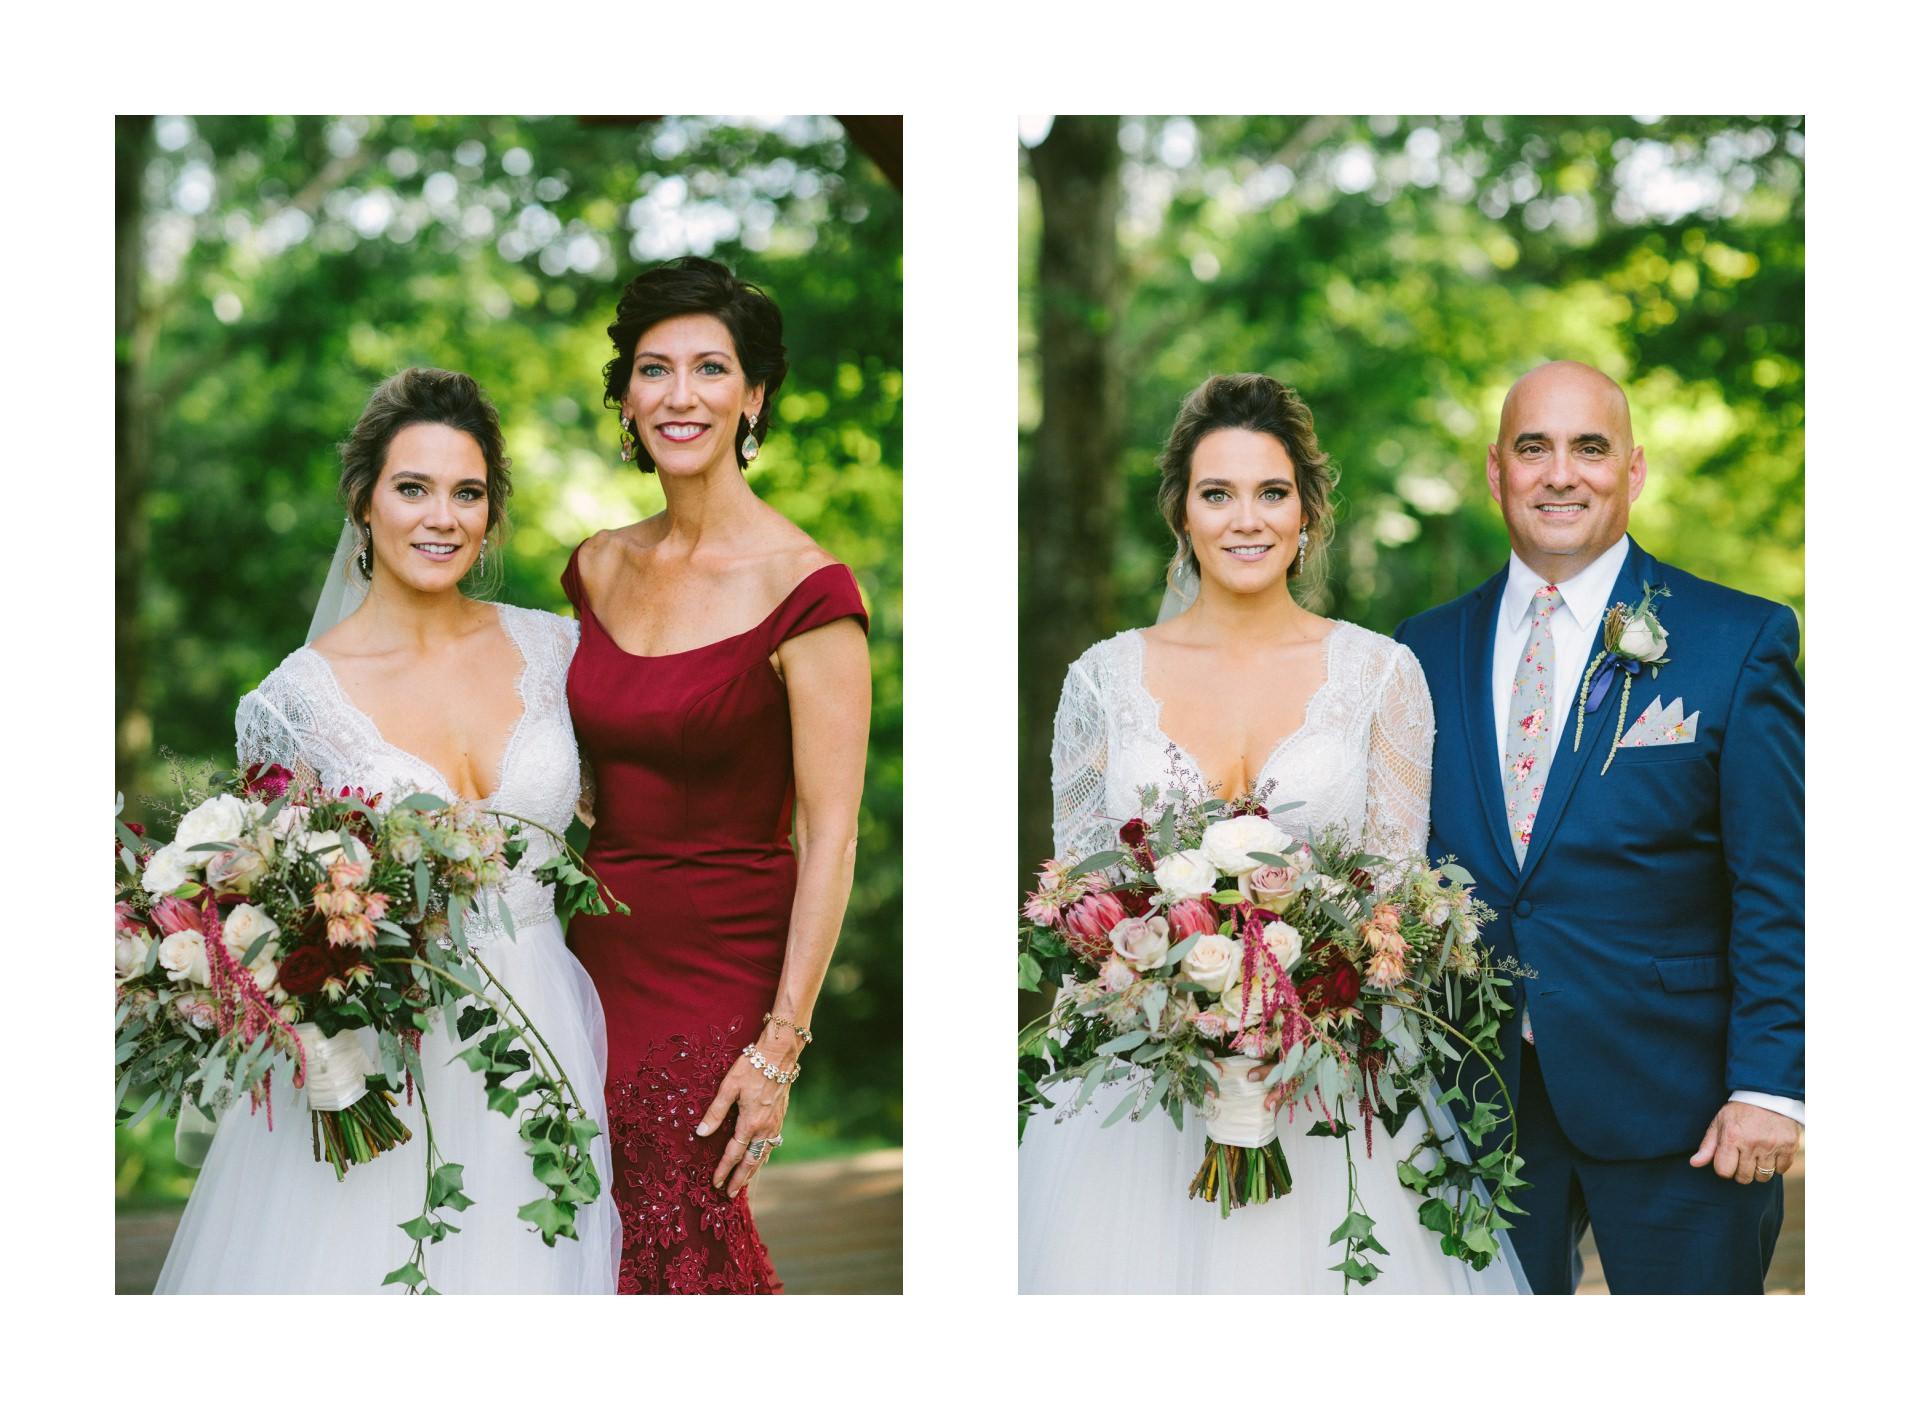 Meadow Ridge Farm Wedding Photos in Windsor 2 38.jpg